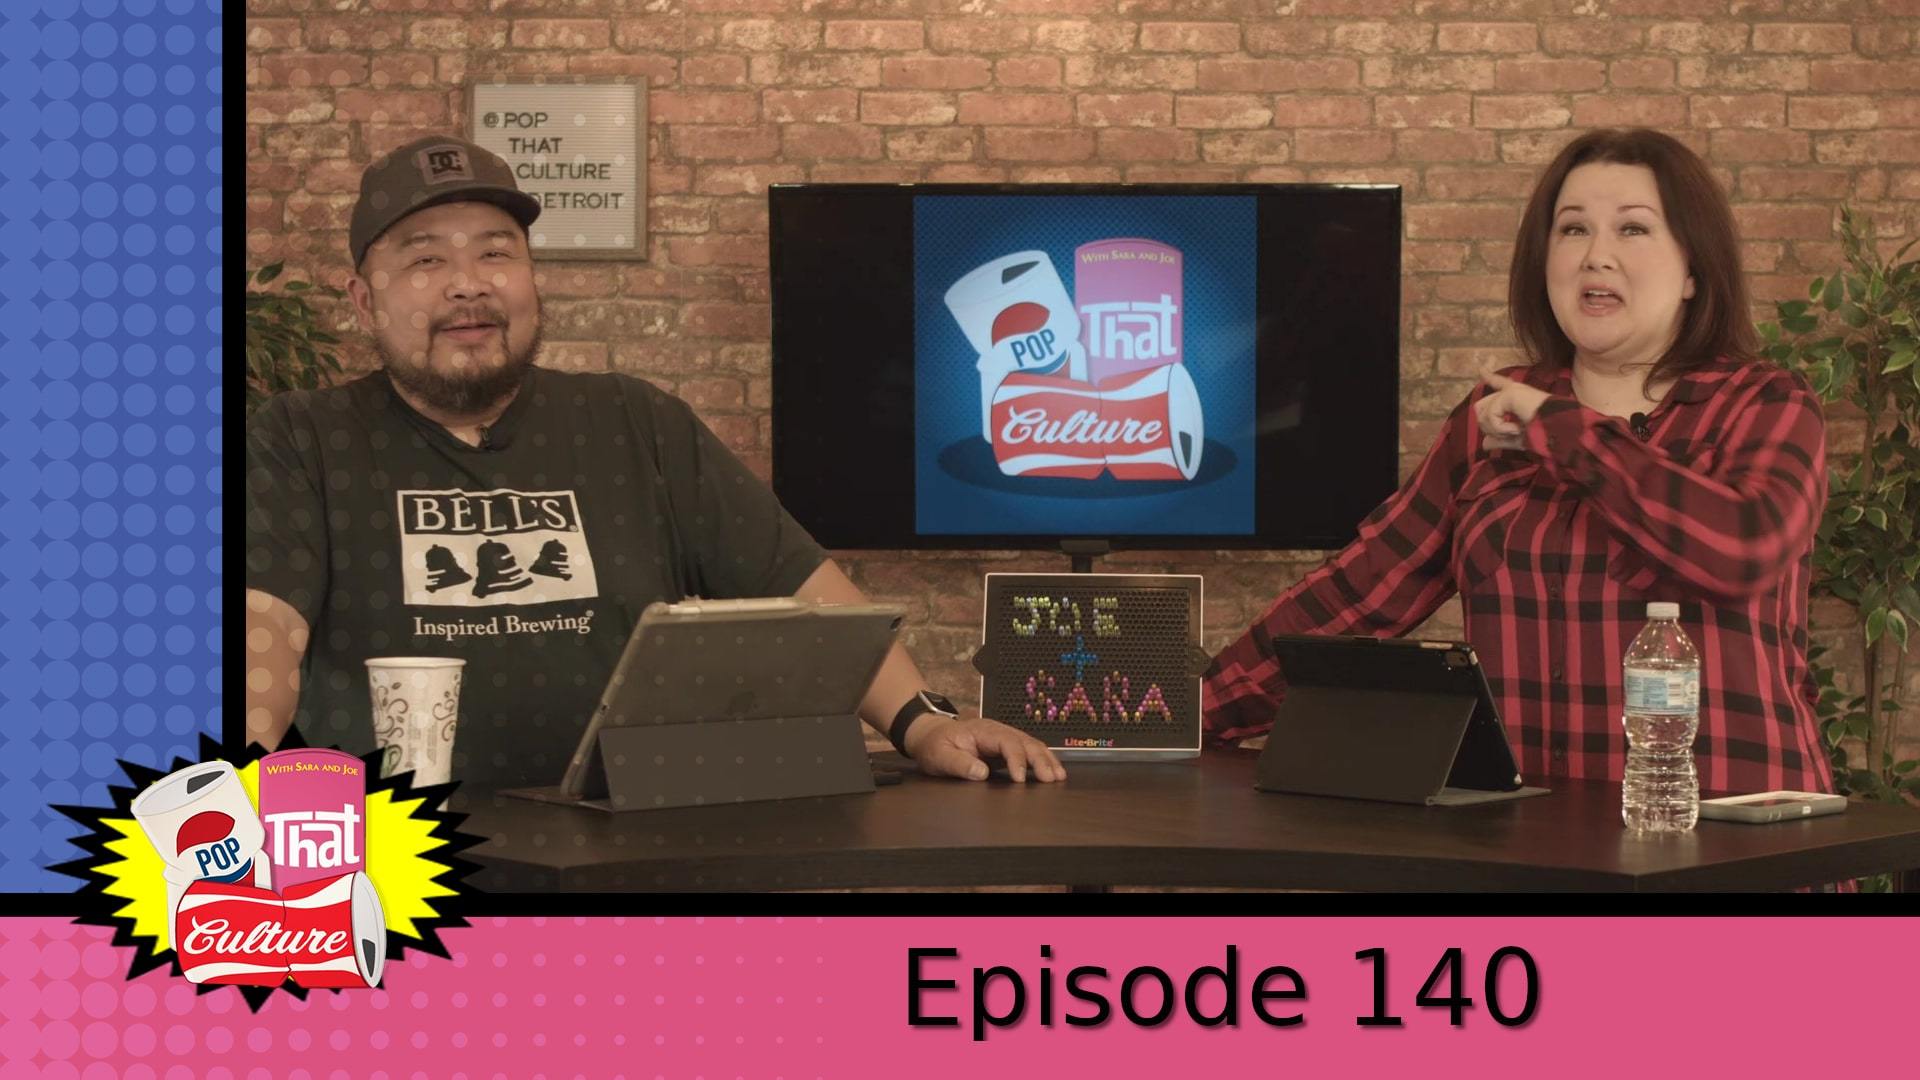 Pop That Culture - Episode 140